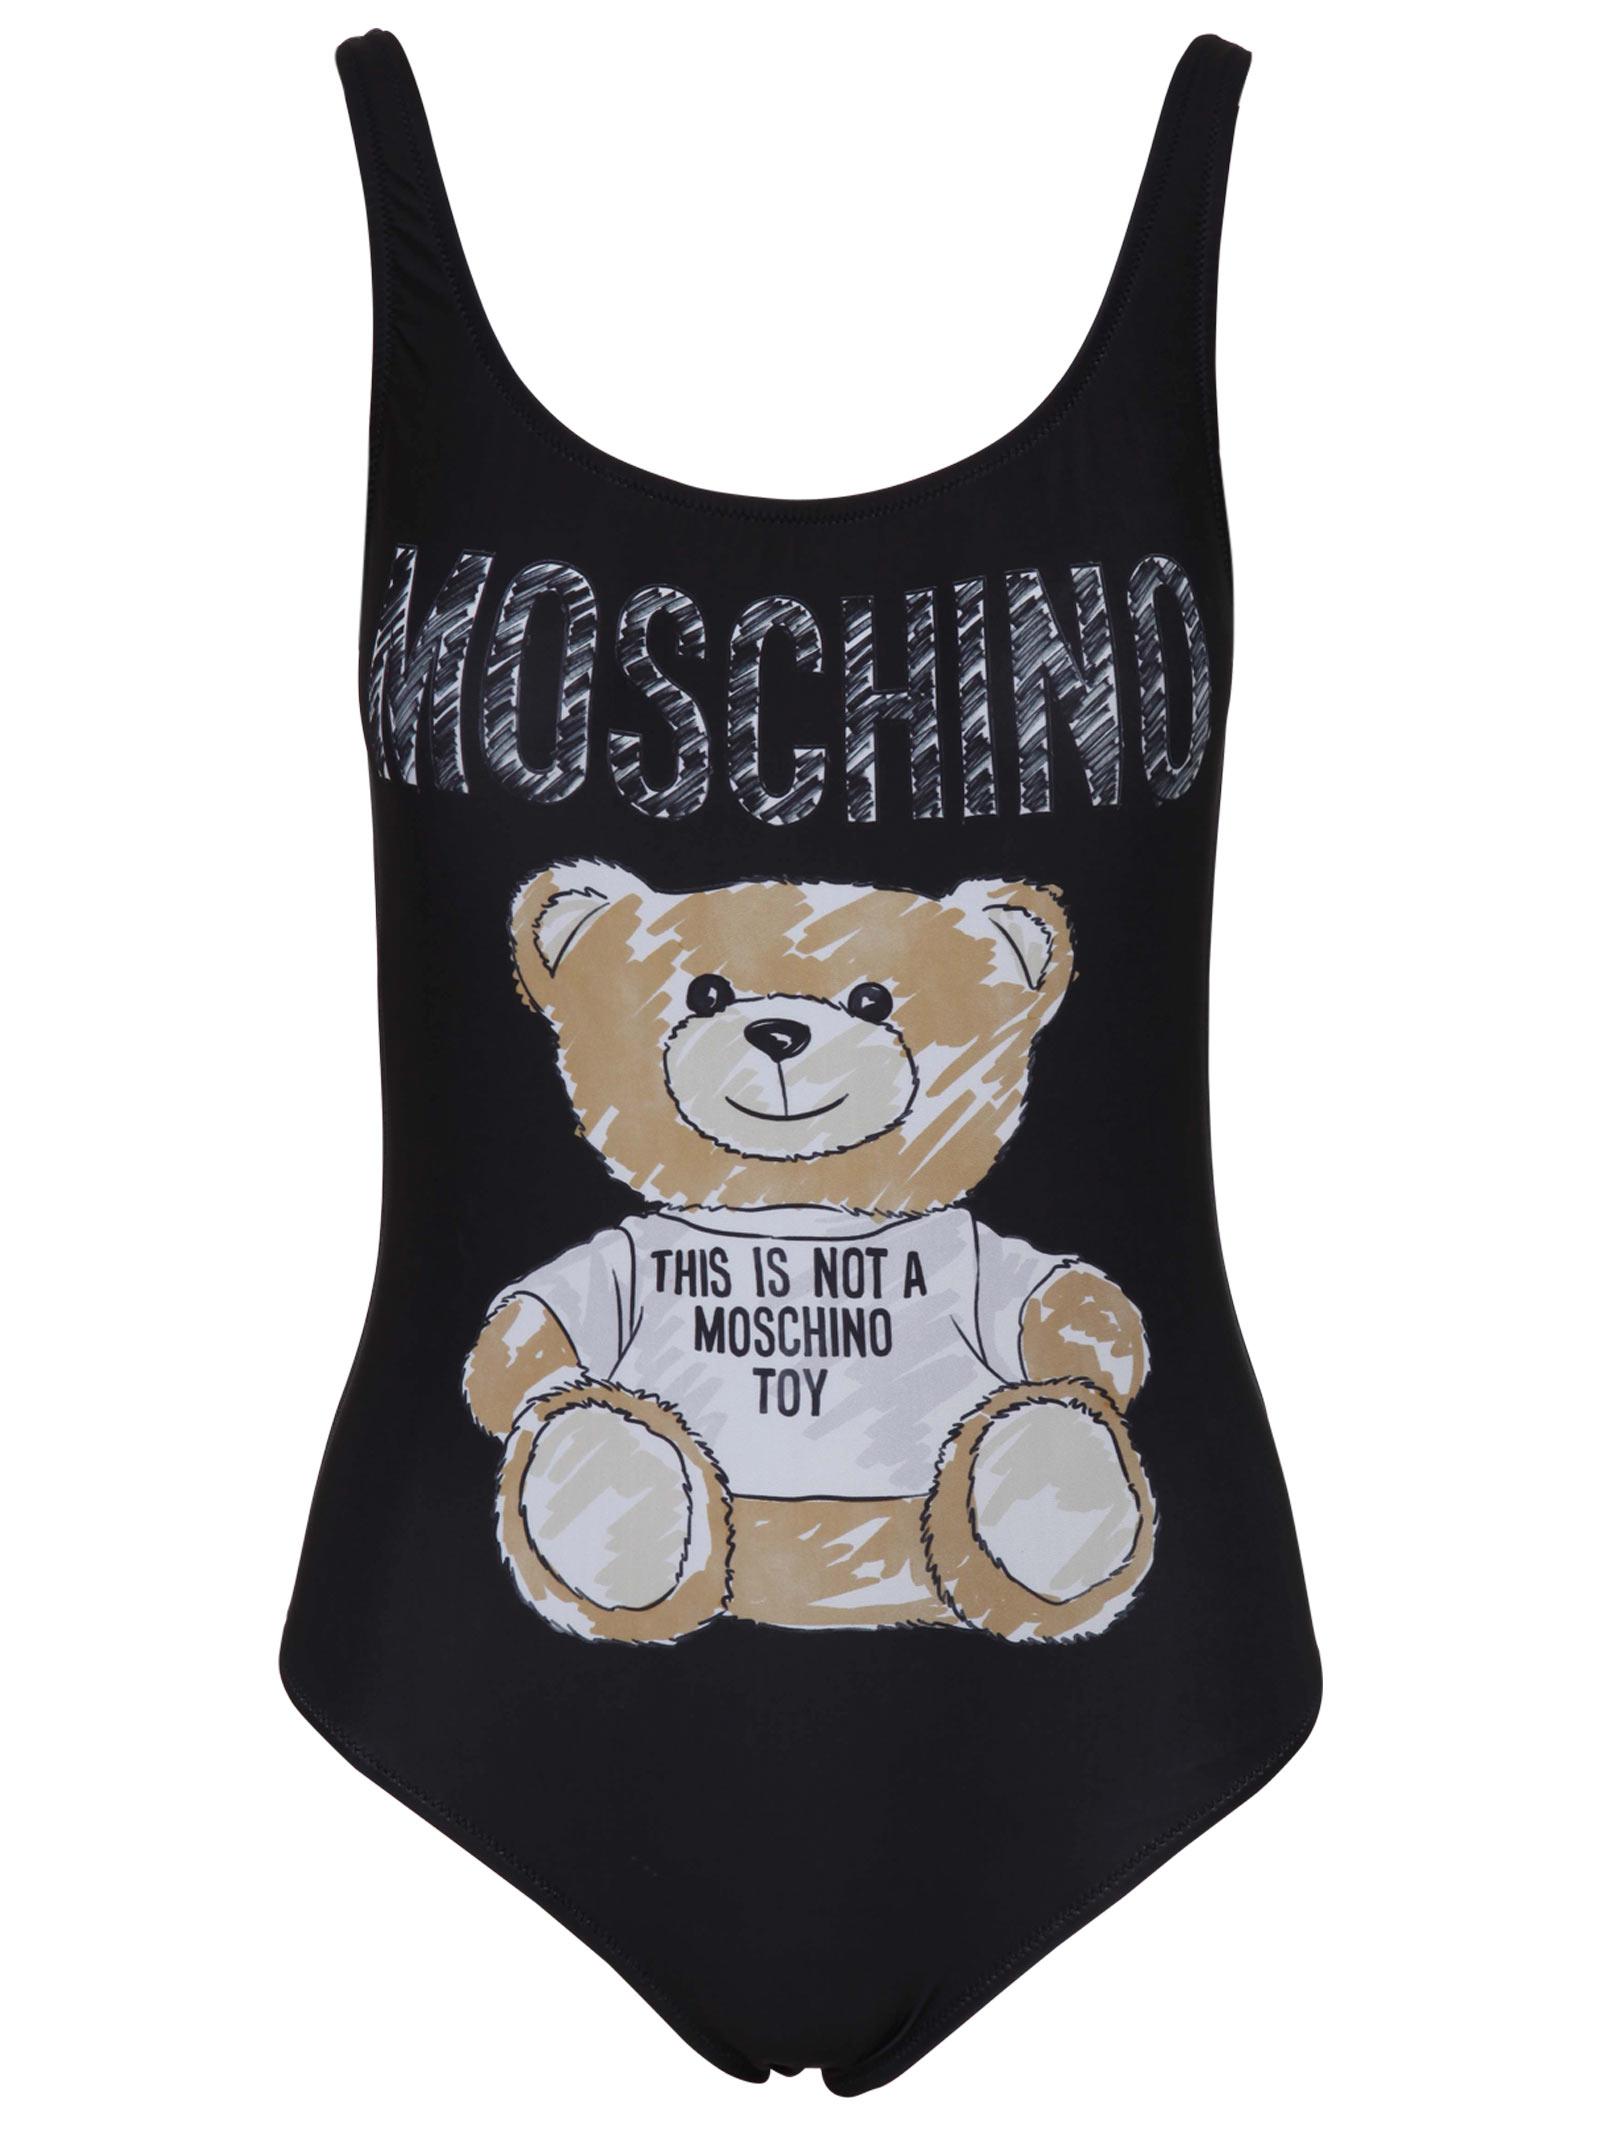 19910e8d8c Moschino Swimsuit - Moschino - Michele Franzese Moda